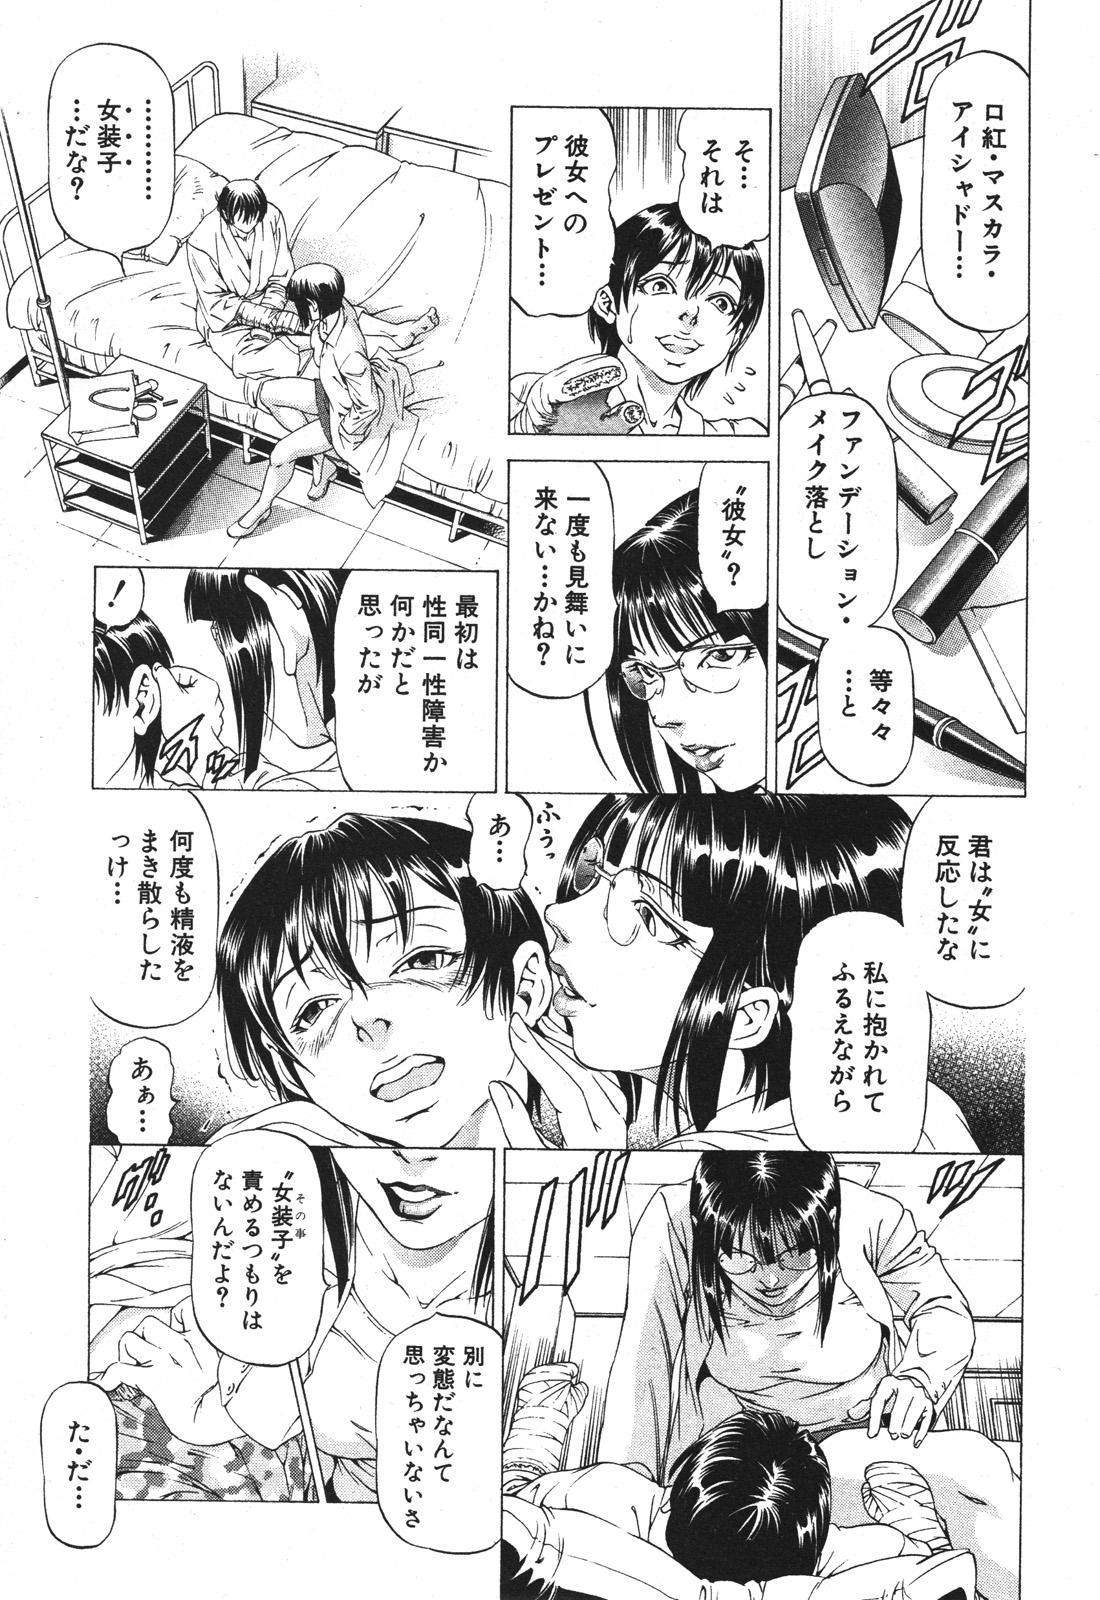 BUSTER COMIC 2010-05 Vol.07 163